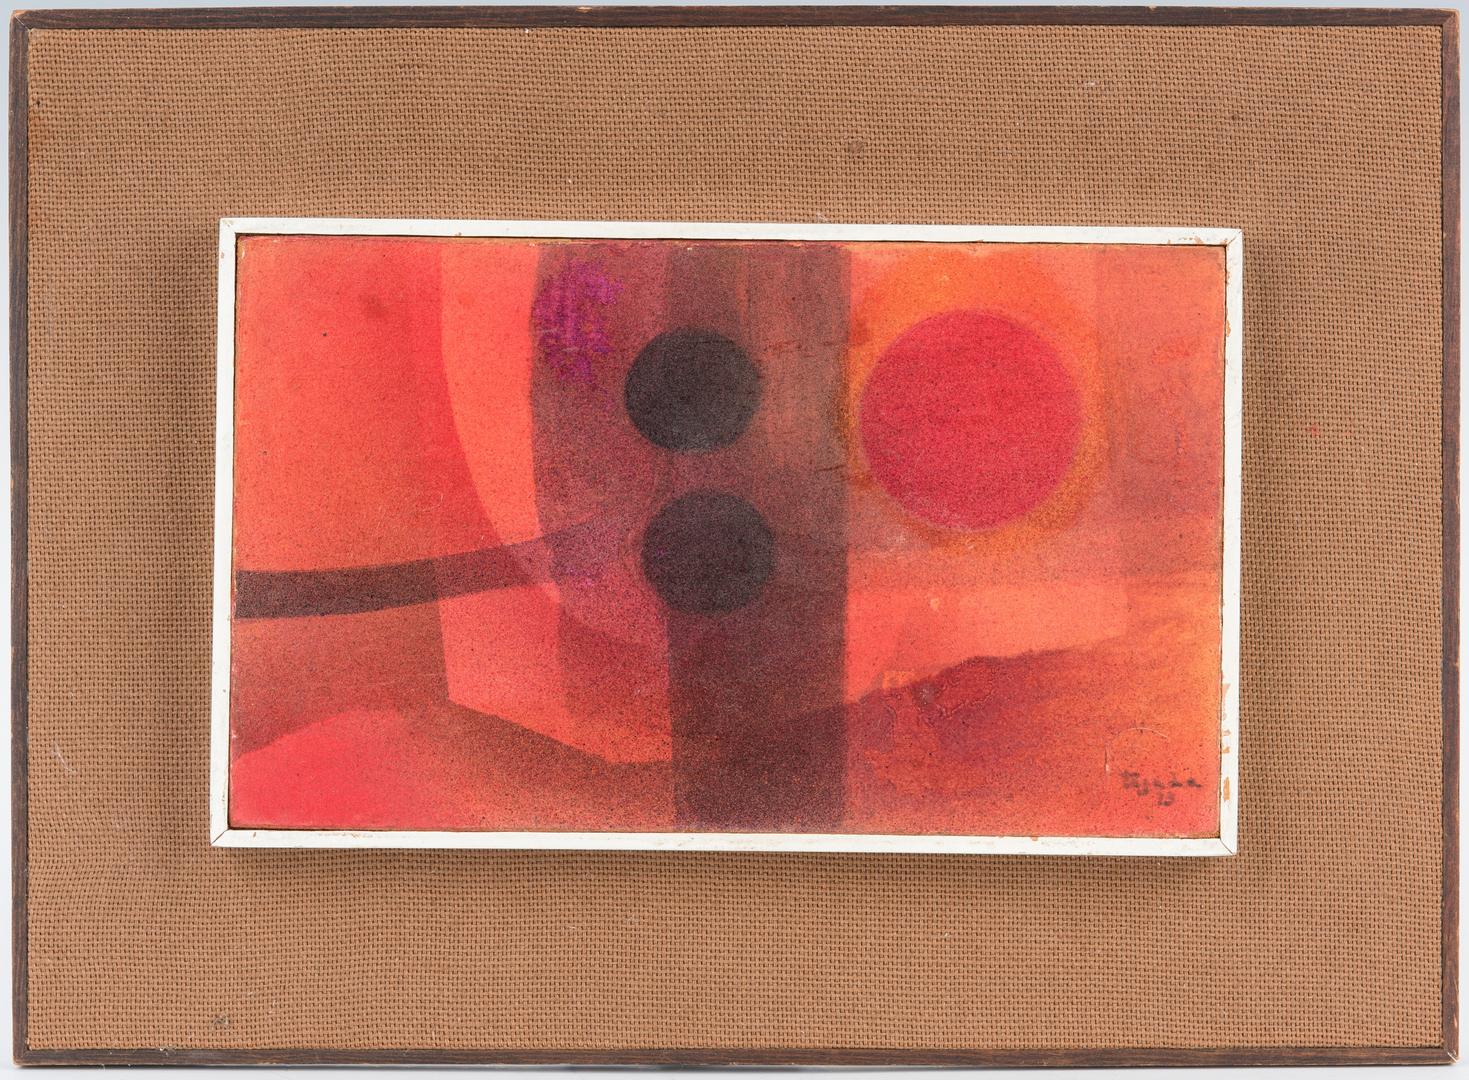 Lot 904: 2 Abstract Paintings, Okoshi and Tejada